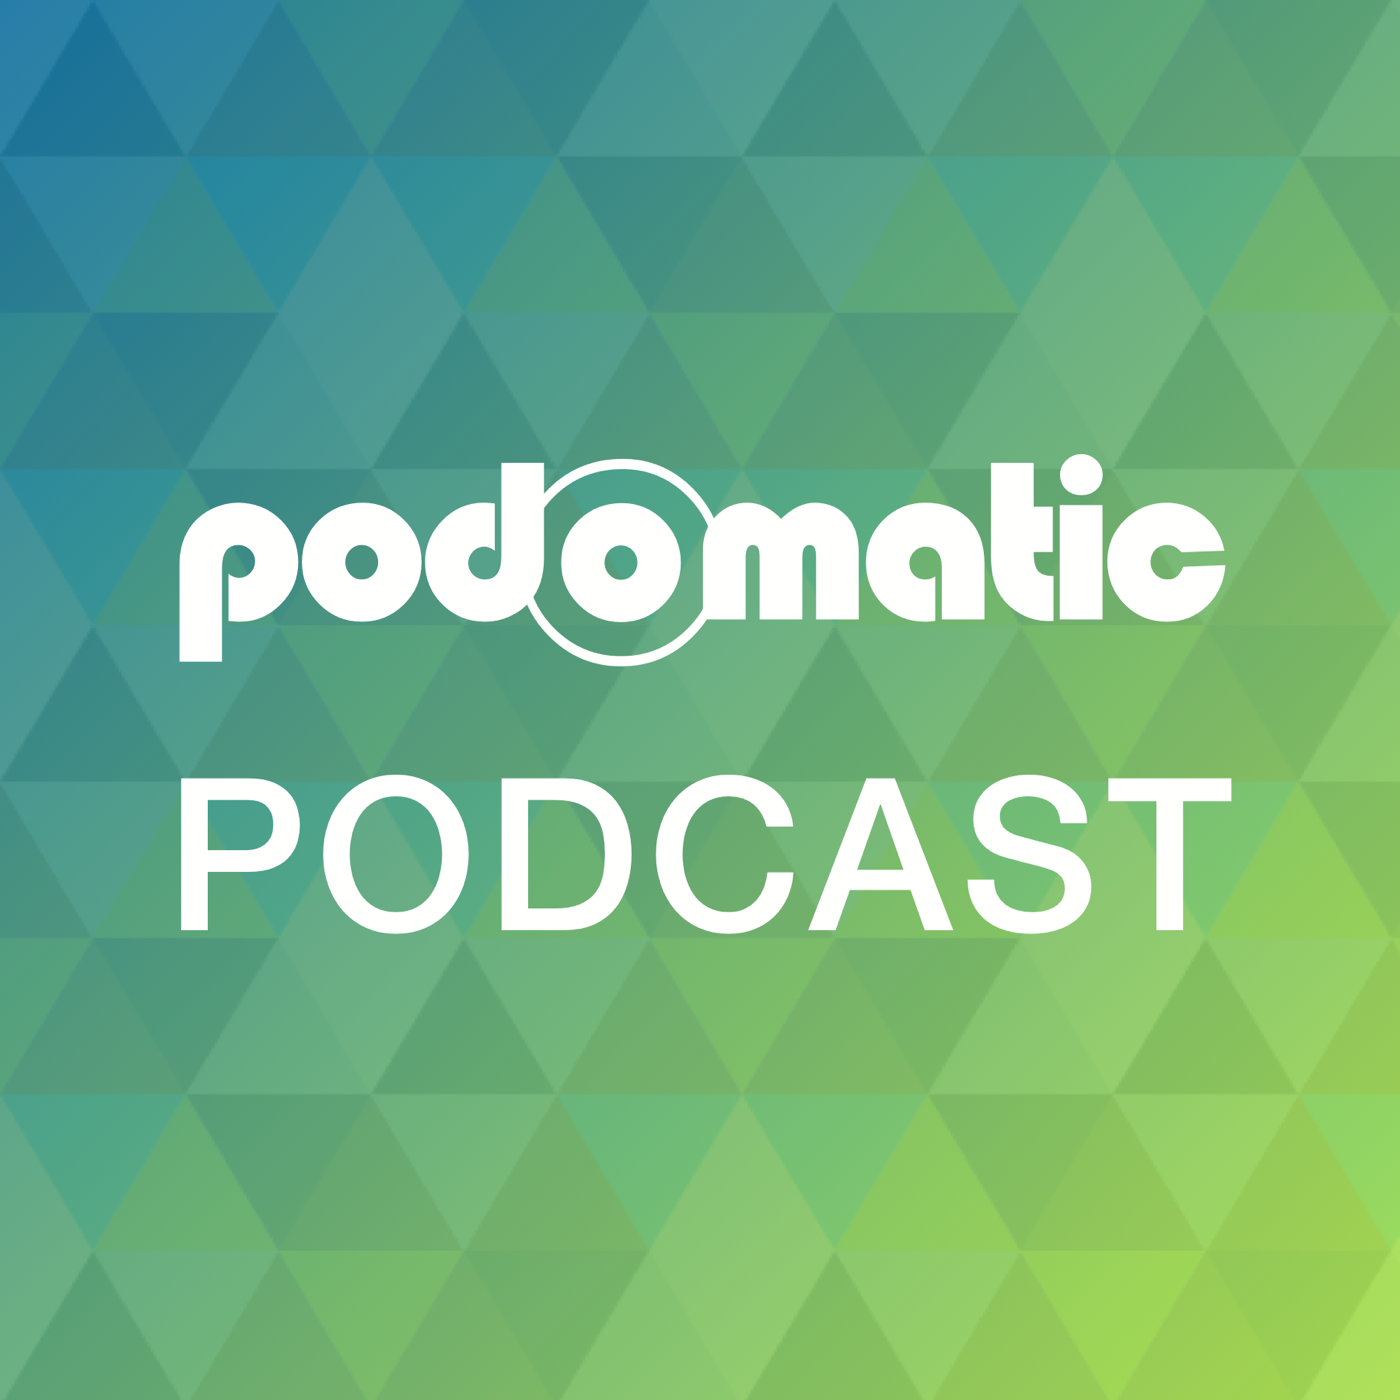 Shana Lander's Podcast